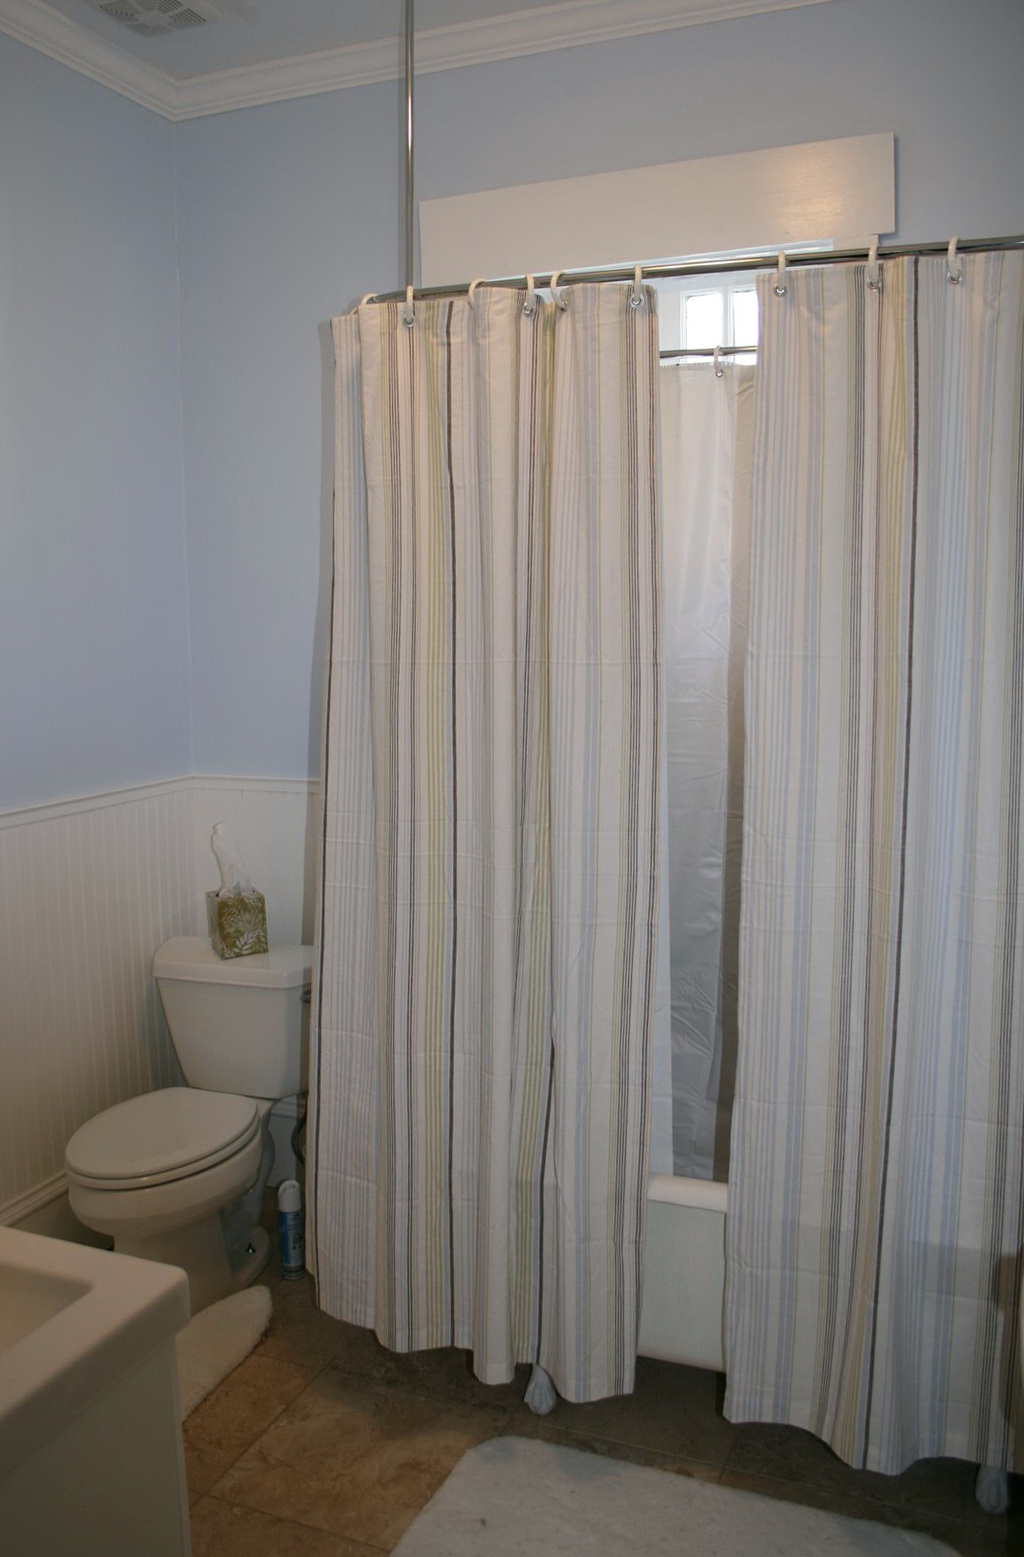 Shower Curtain Ideas For Clawfoot Tub Home Design Ideas